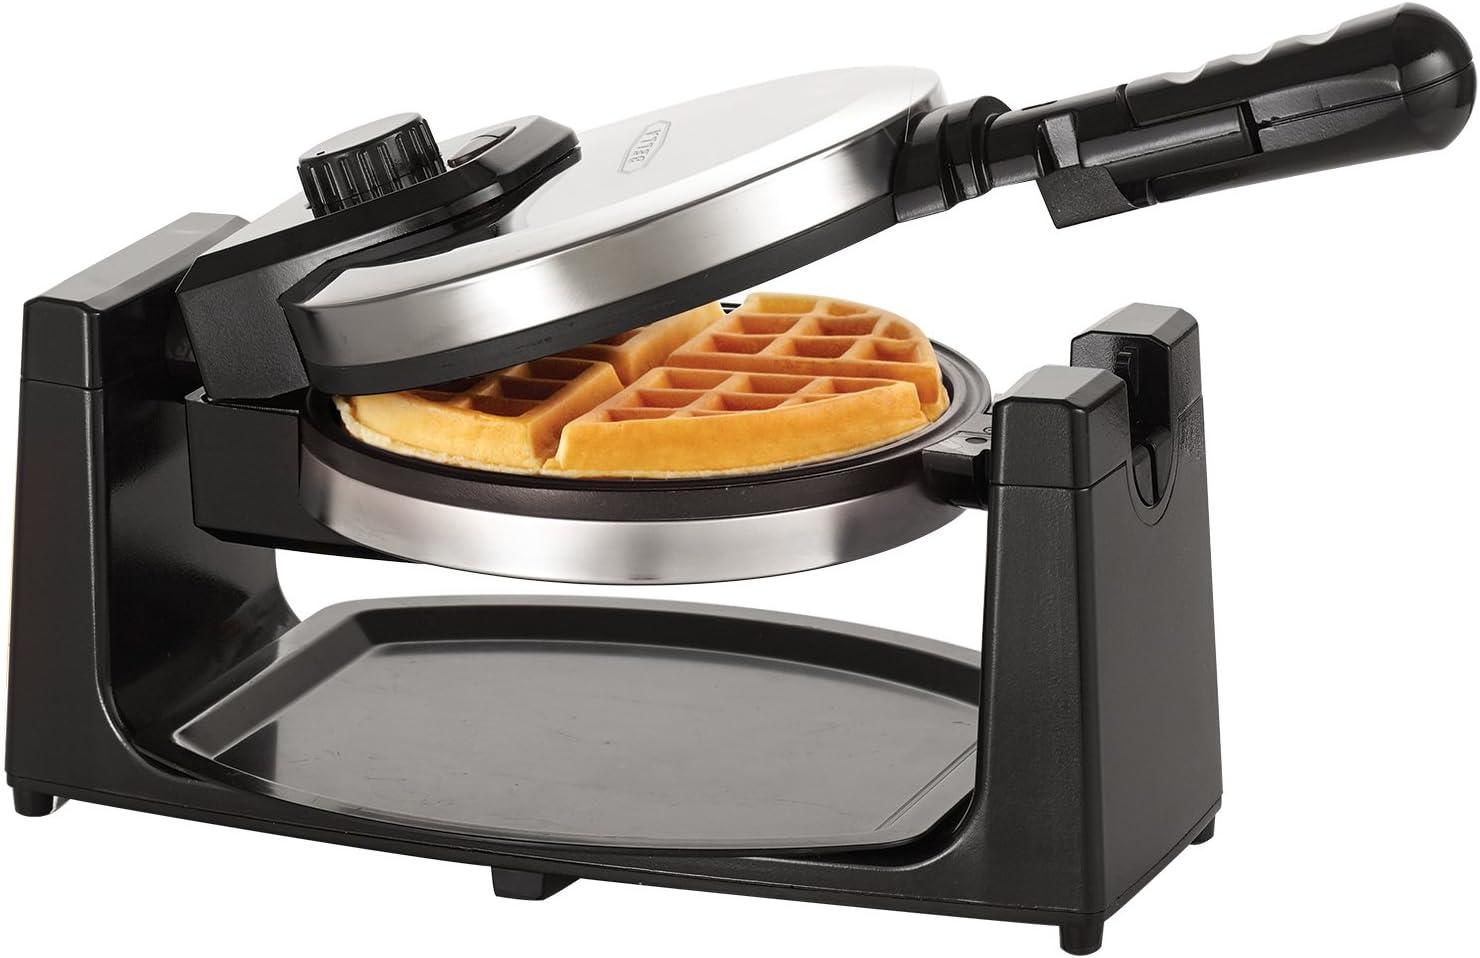 Bella waffle maker reviews / Waffle maker best price